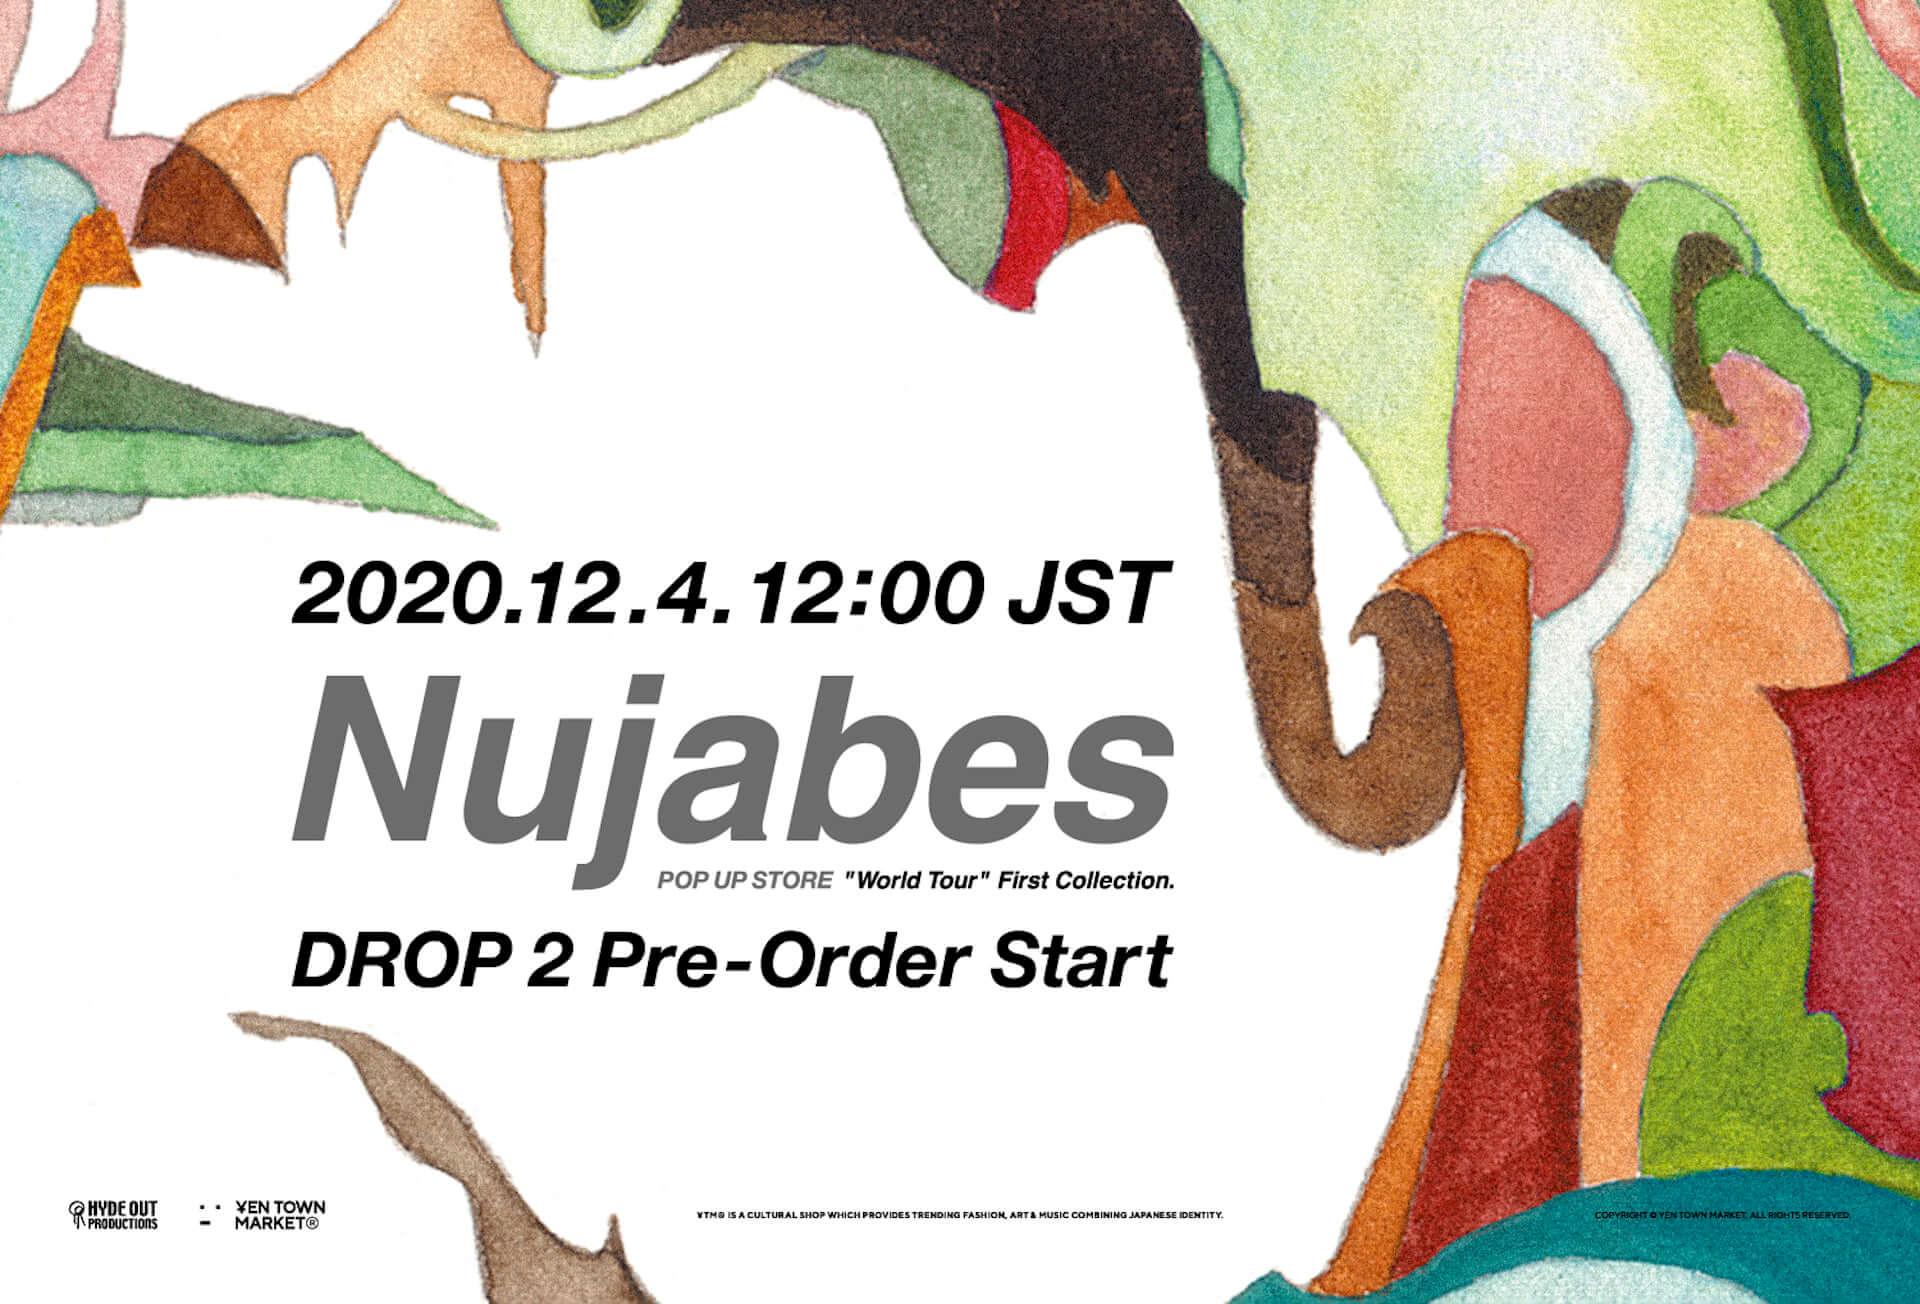 Nujabesの名盤『metaphorical music』ジャケットが施されたiPhoneケース、AirPodsケースなど続々登場!ポップアップ最新グッズの予約受付が明日開始 lf201203_nujabes_1-1920x1304